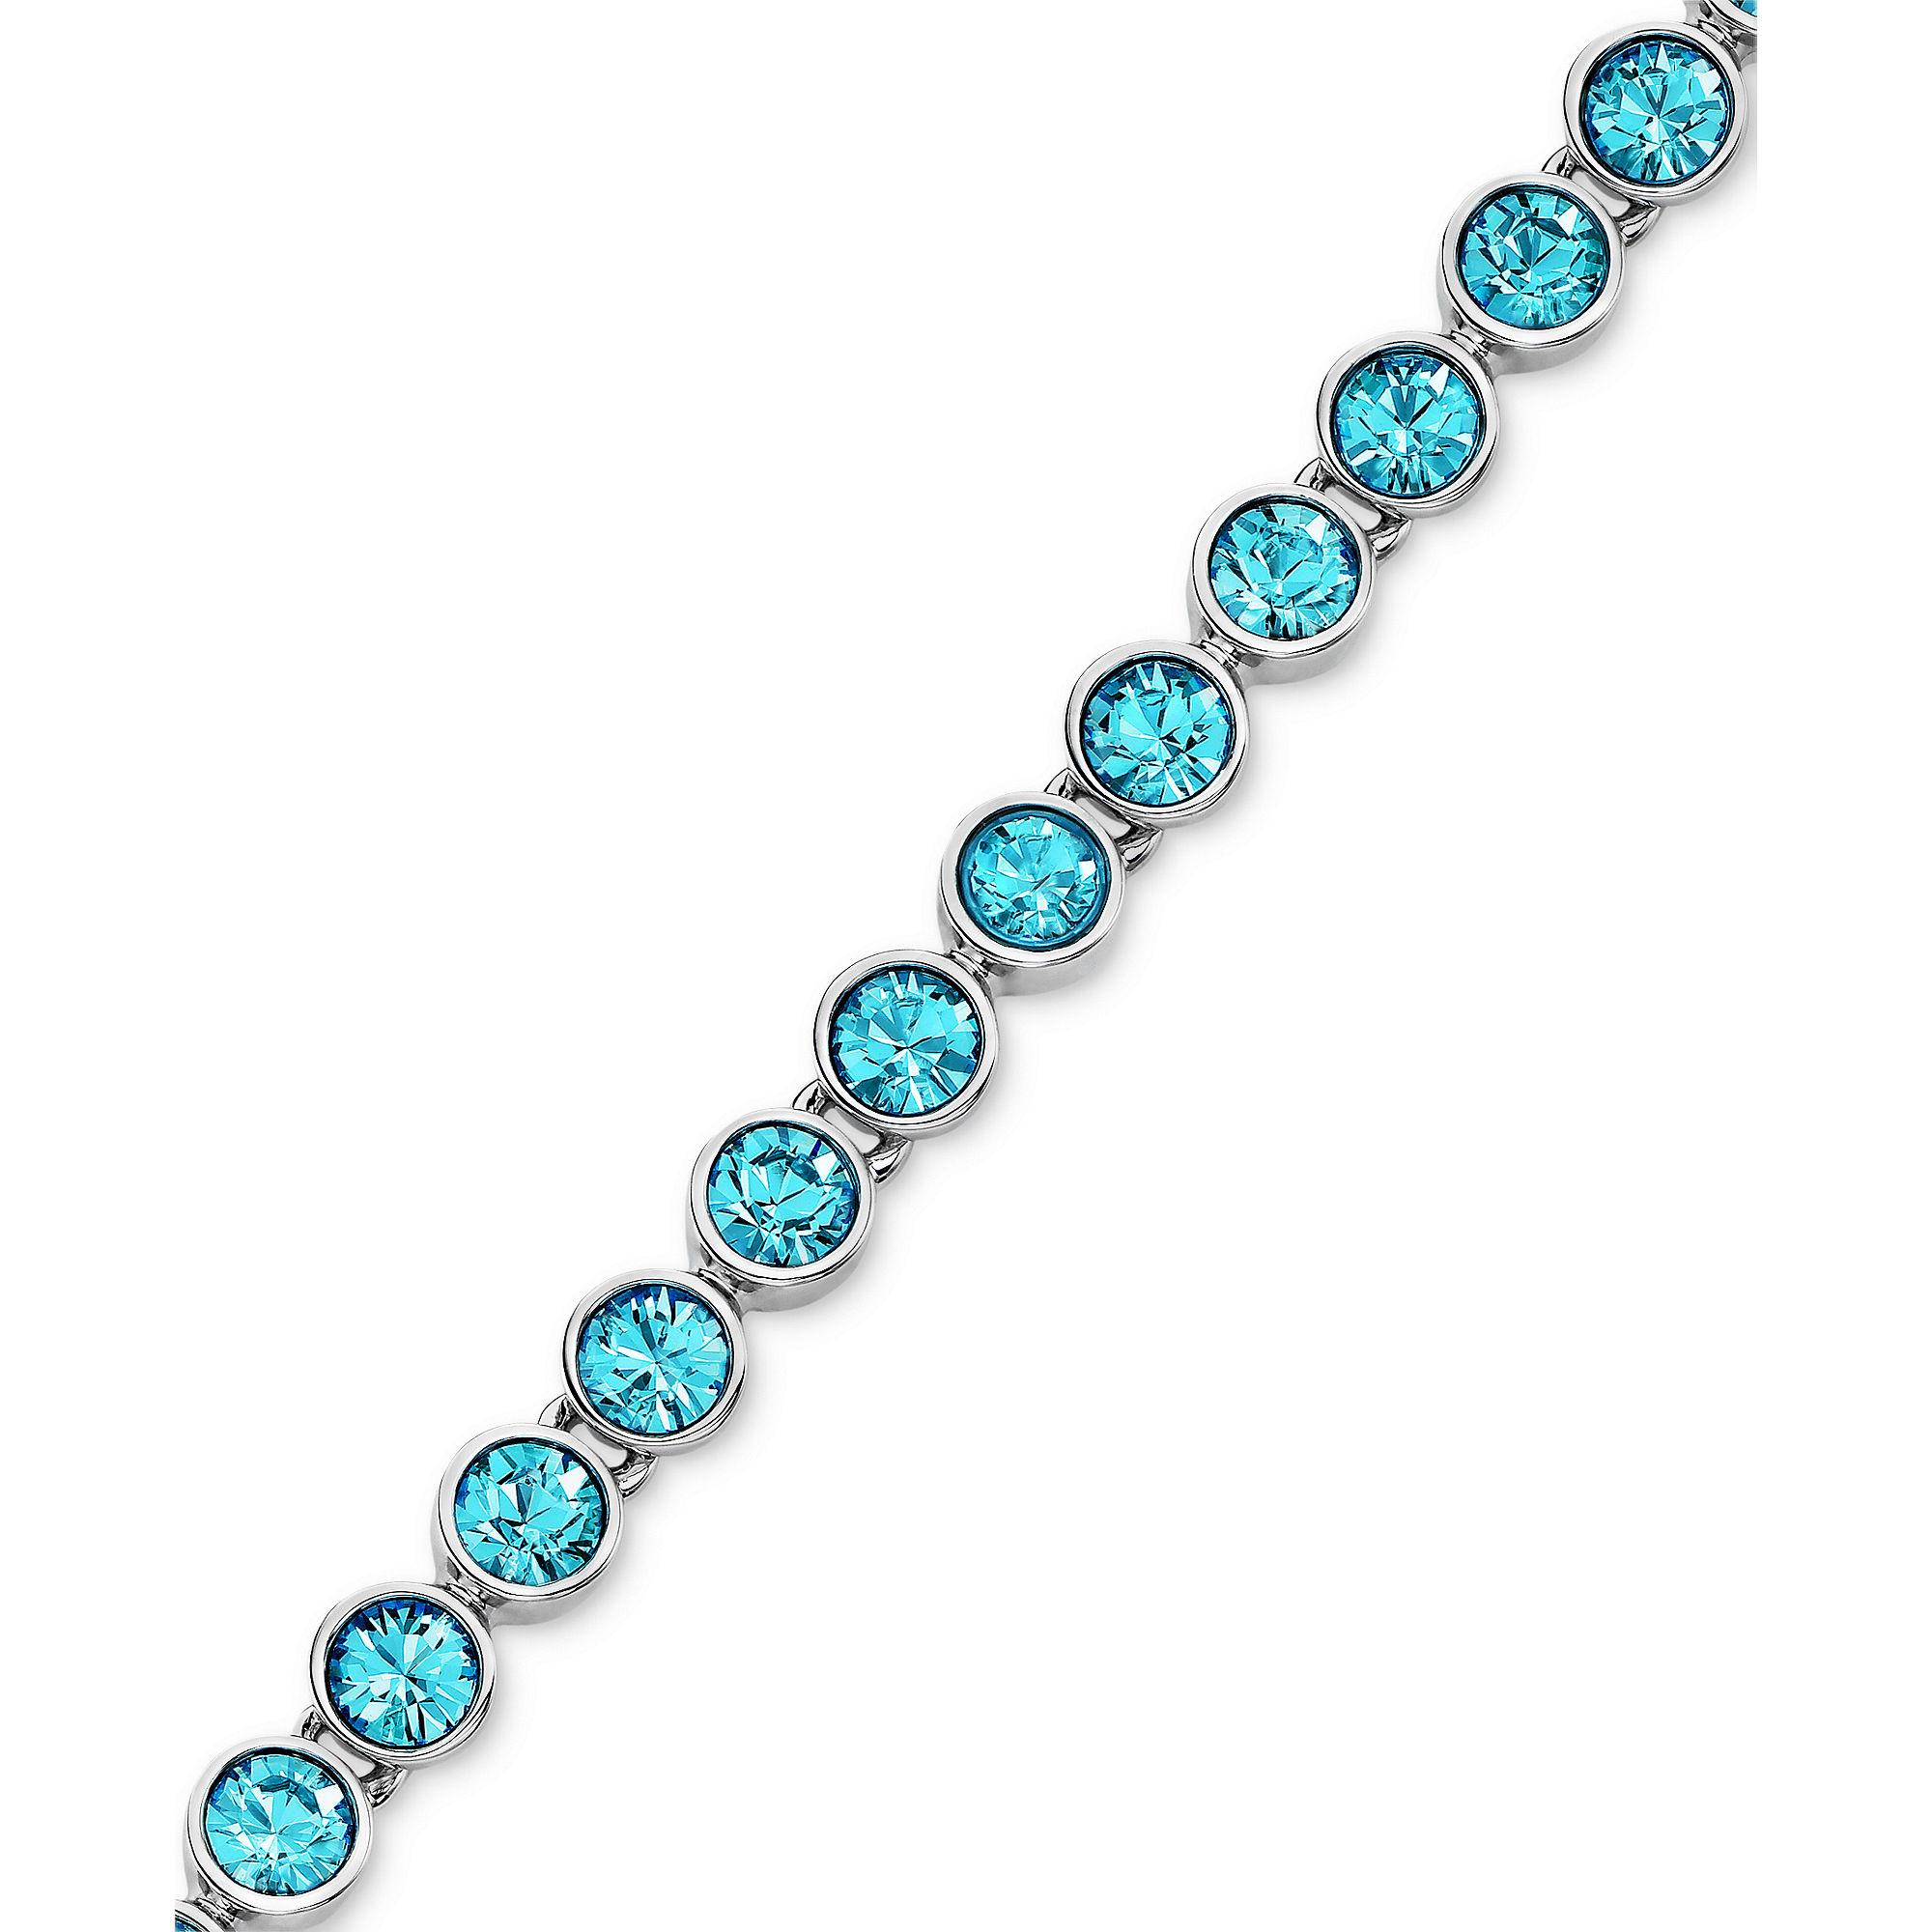 swarovski rhodiumplated aquamarine crystal tennis bracelet. Black Bedroom Furniture Sets. Home Design Ideas